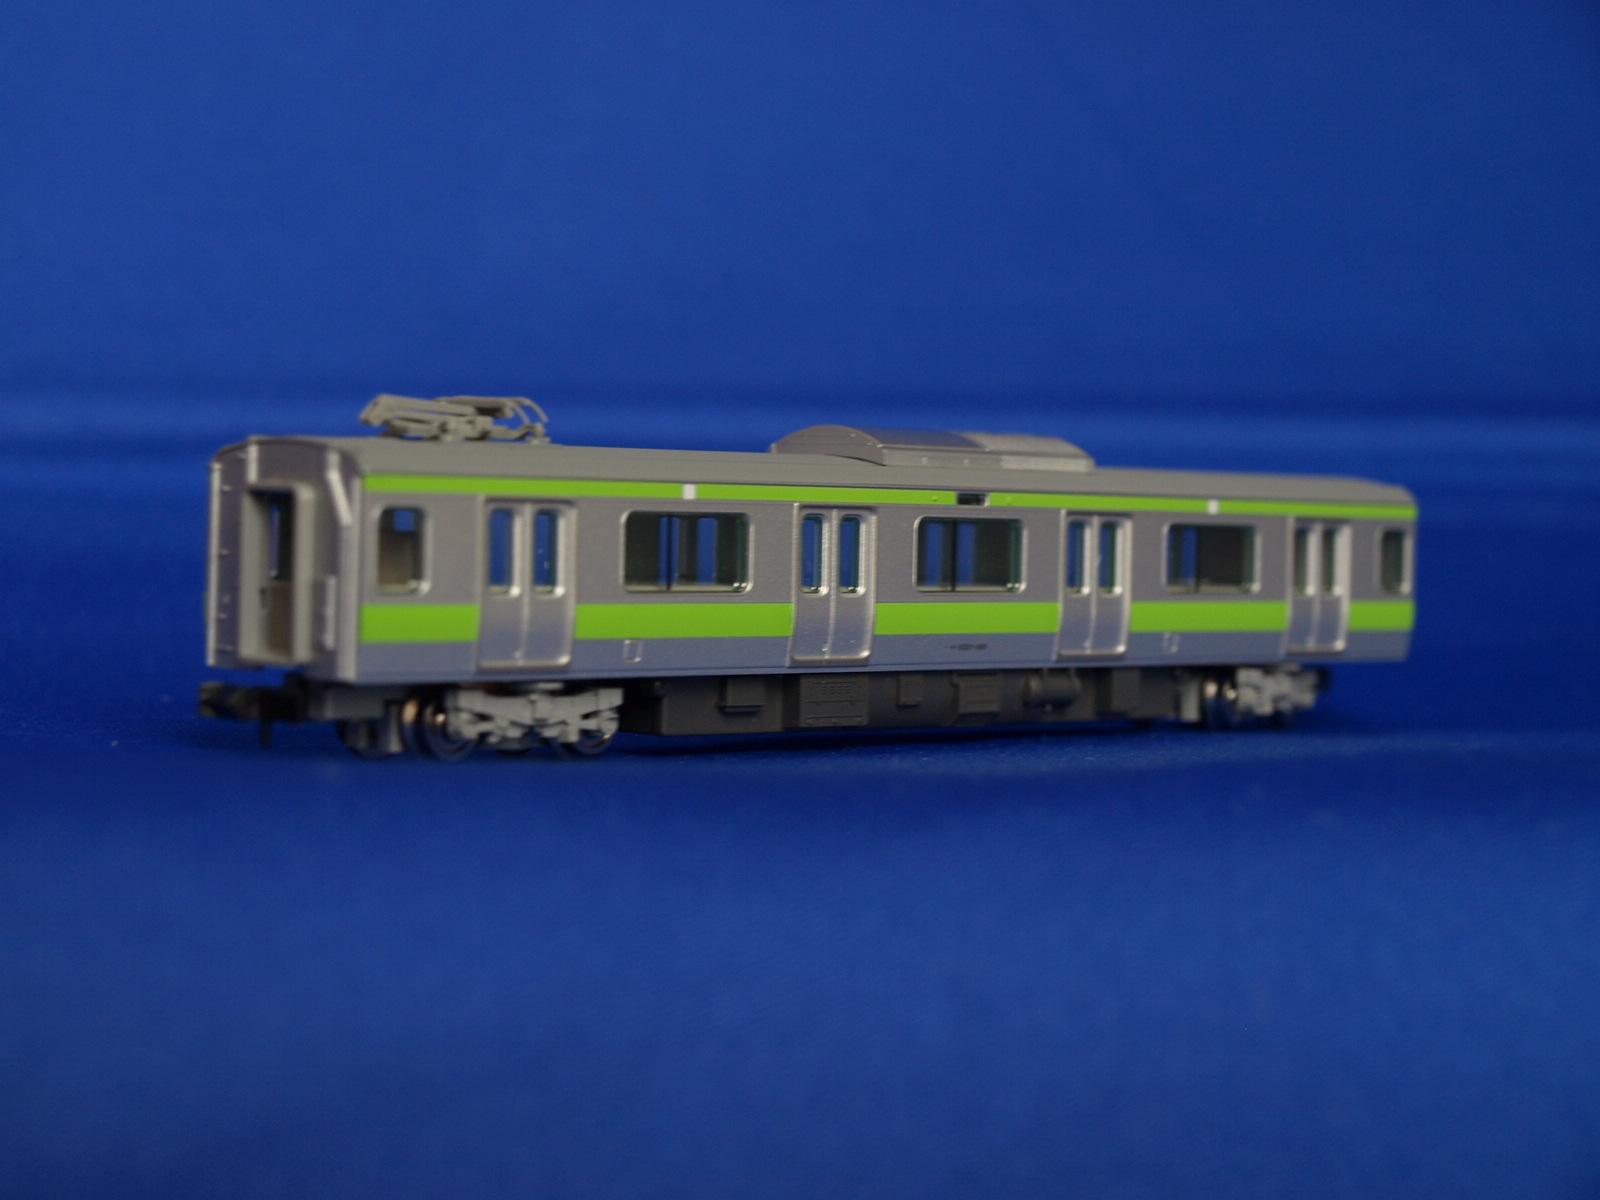 Nゲージ トミックス 92401 JR E231-500系通勤電車(山手線)増結セットC